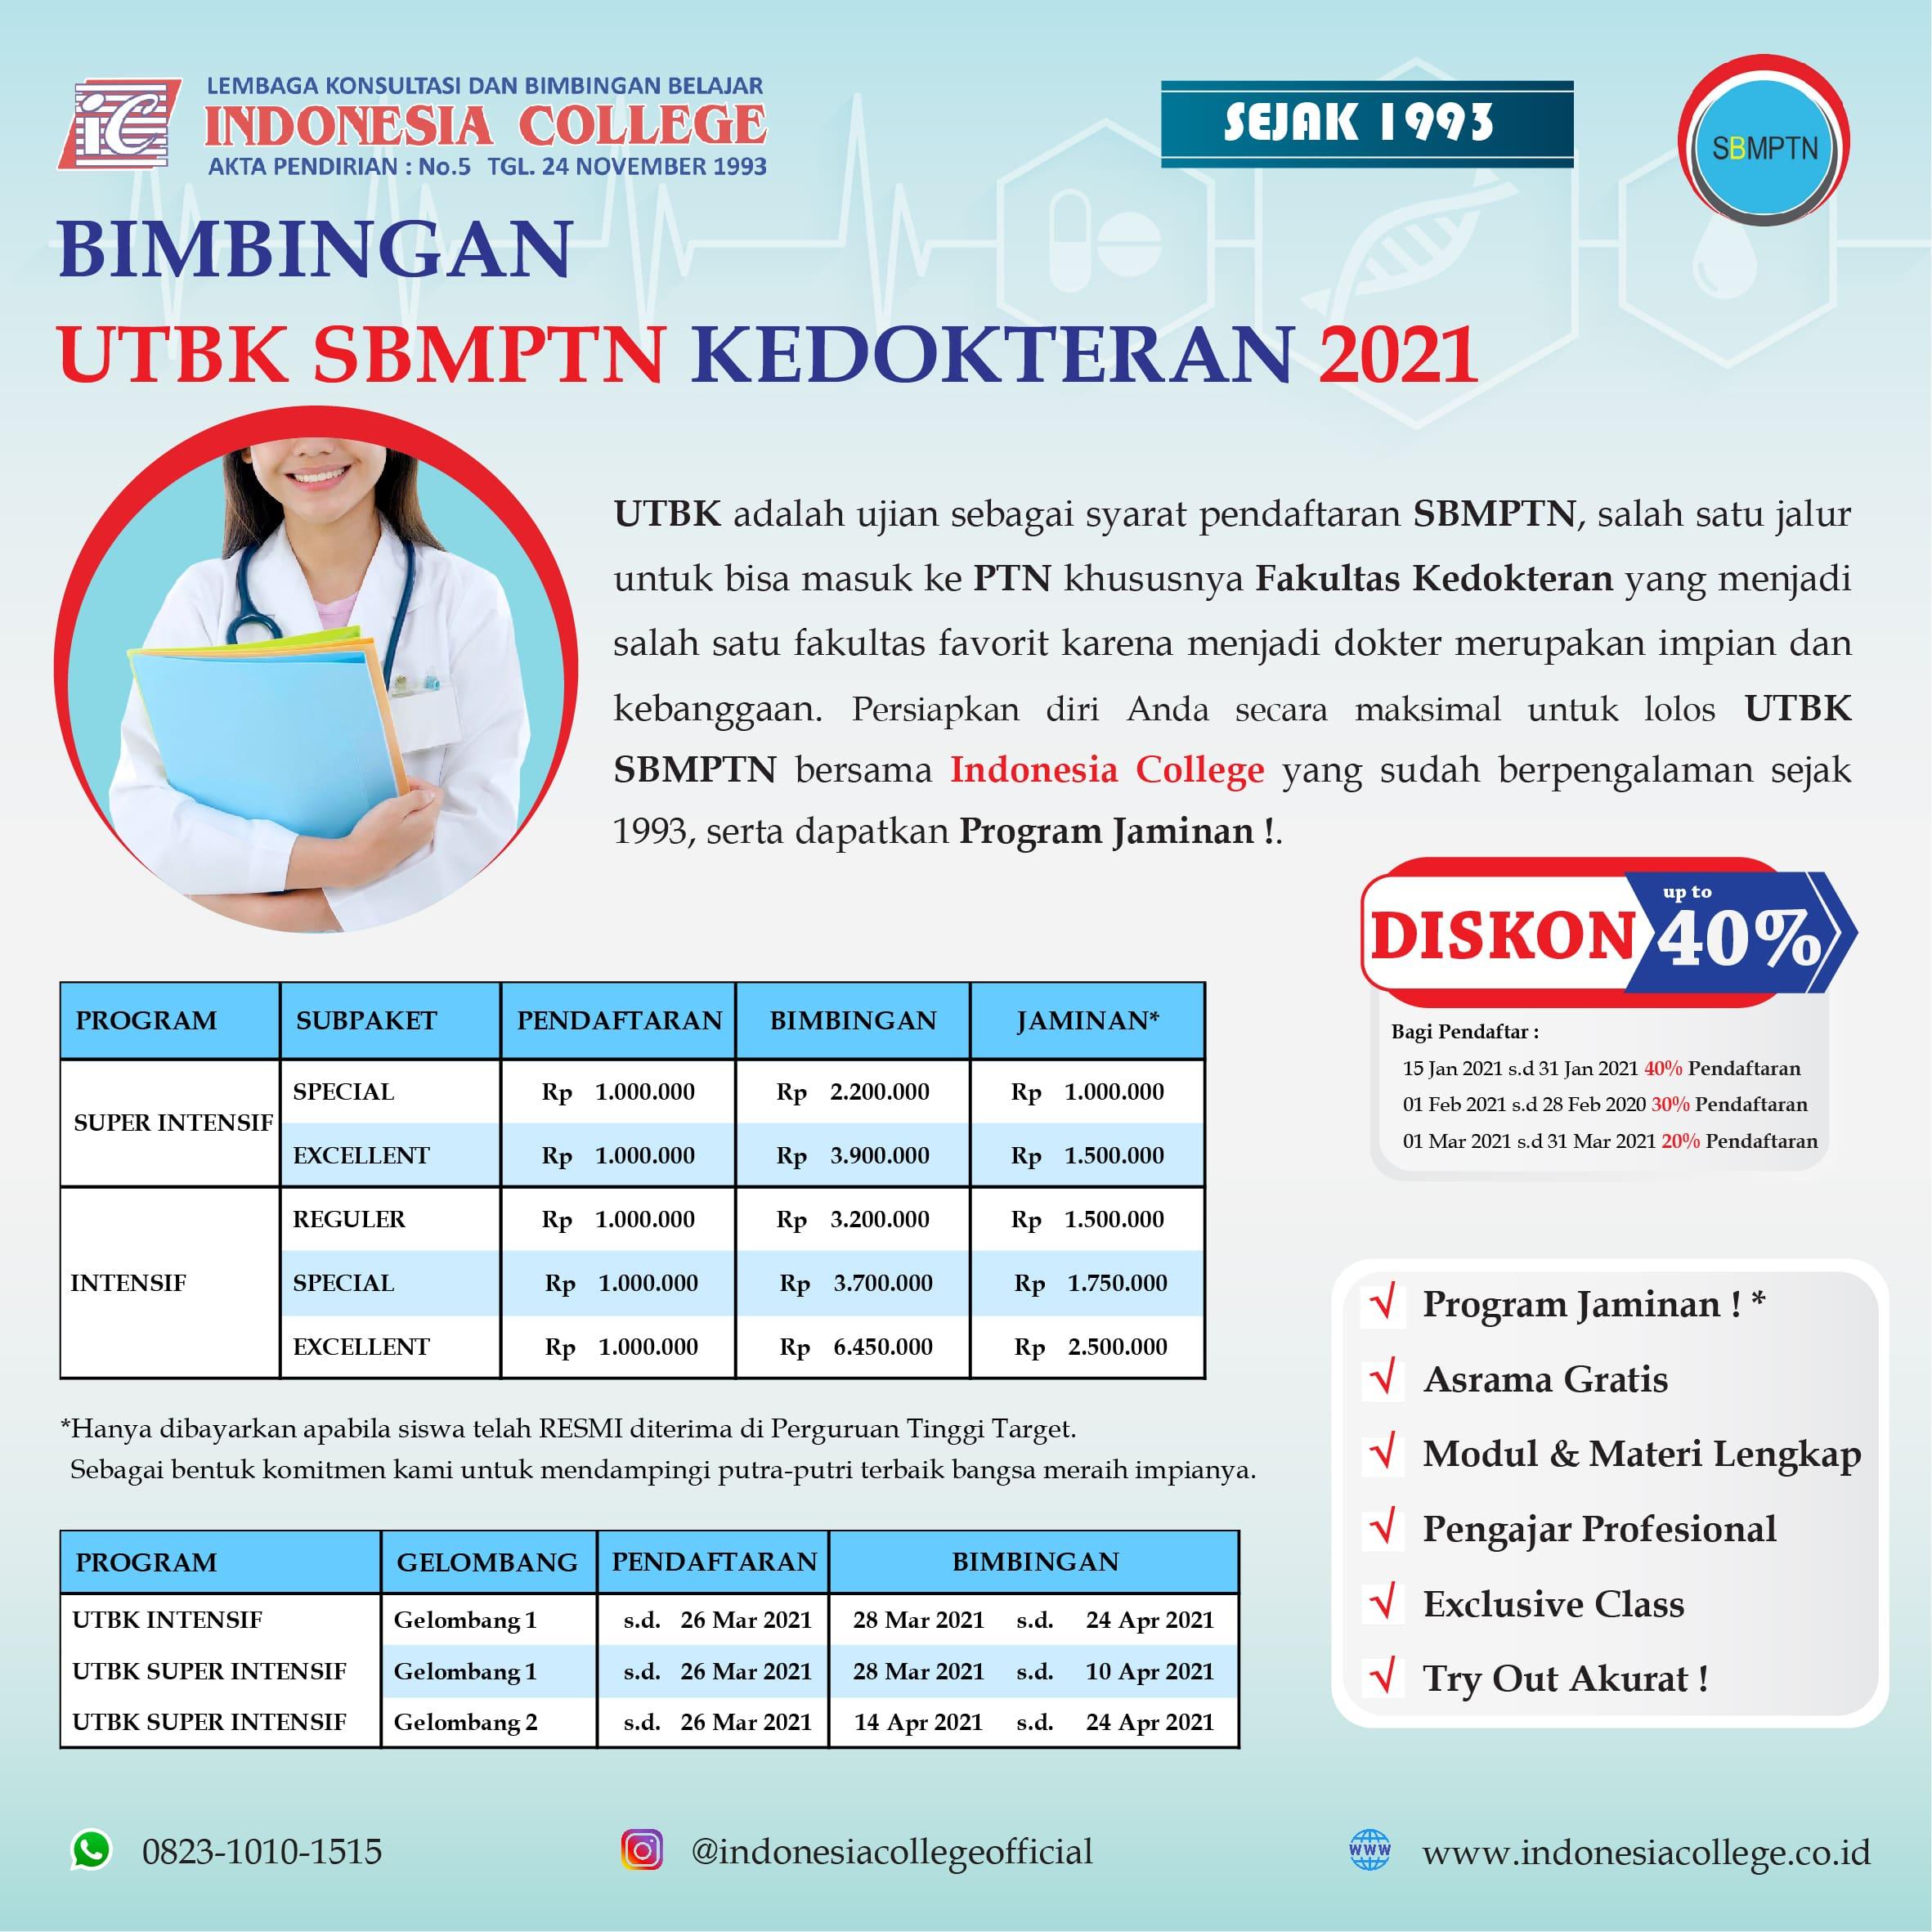 BIMBEL UTBK-SBMPTN 2021 (HARGA) PART-04 ONLINE-min